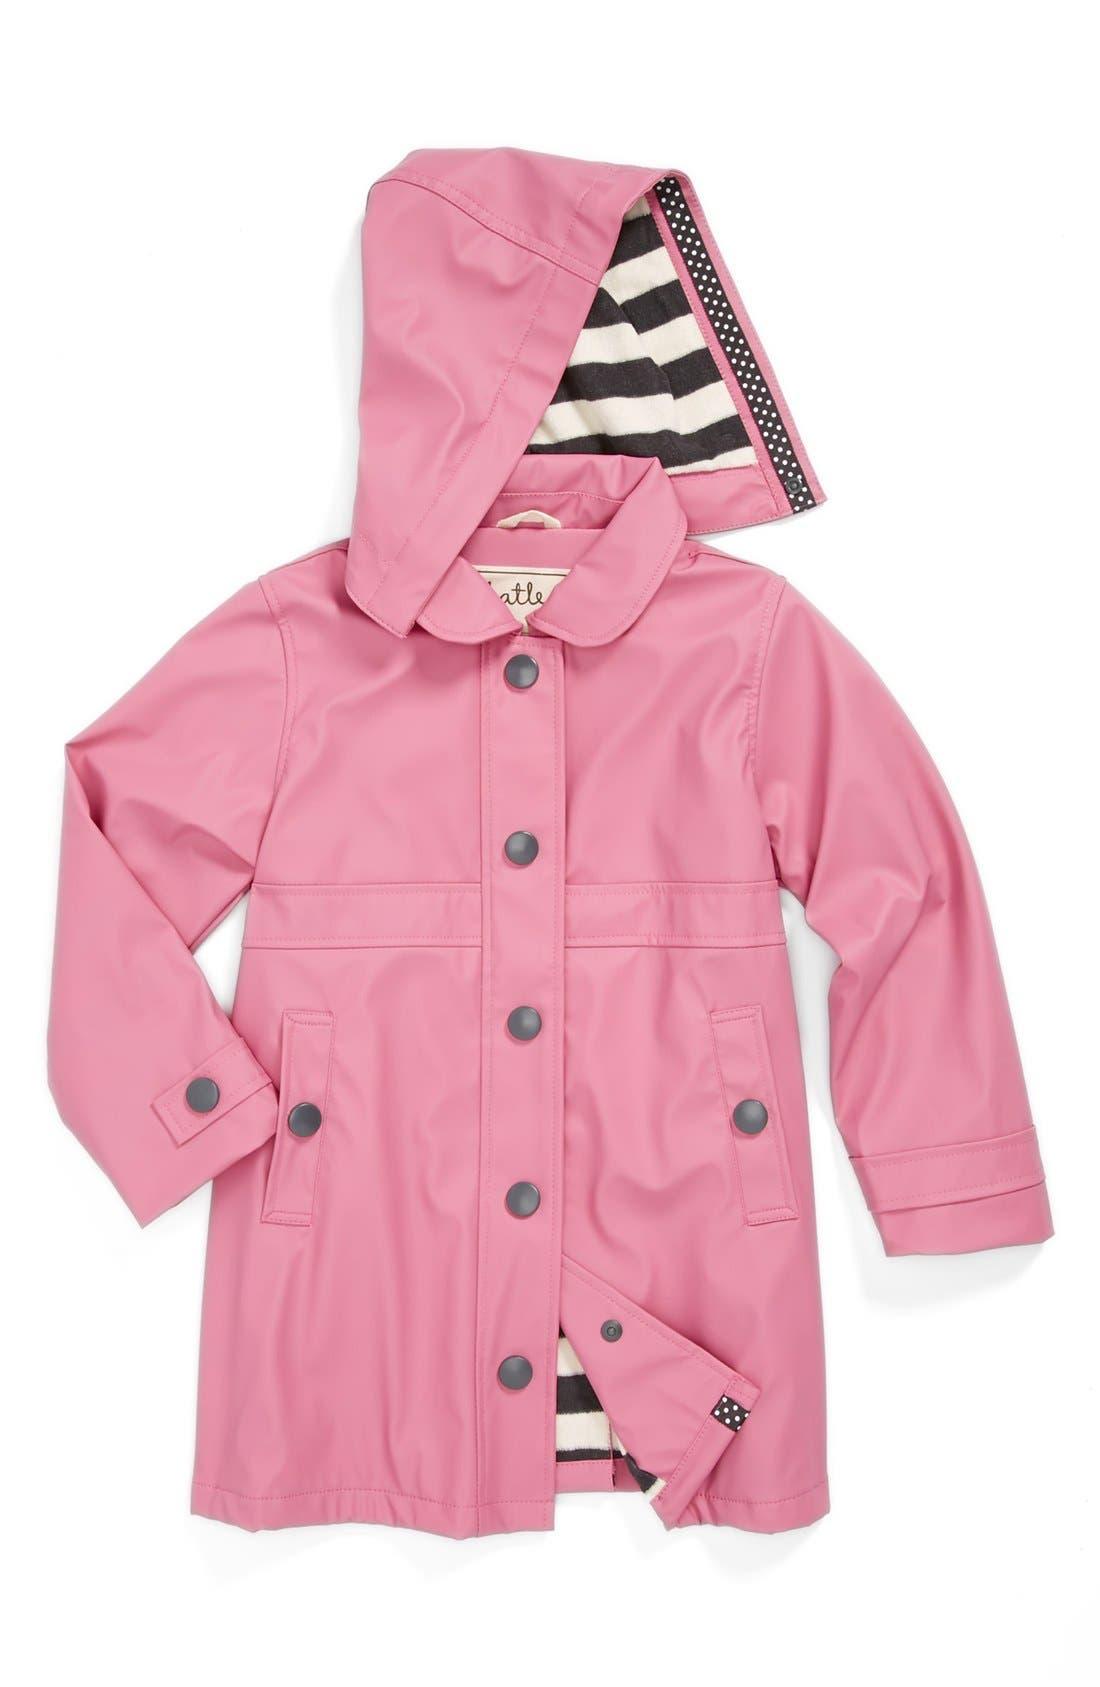 Alternate Image 1 Selected - Hatley 'Orchid Lily' Rain Jacket (Toddler Girls, Little Girls & Big Girls)